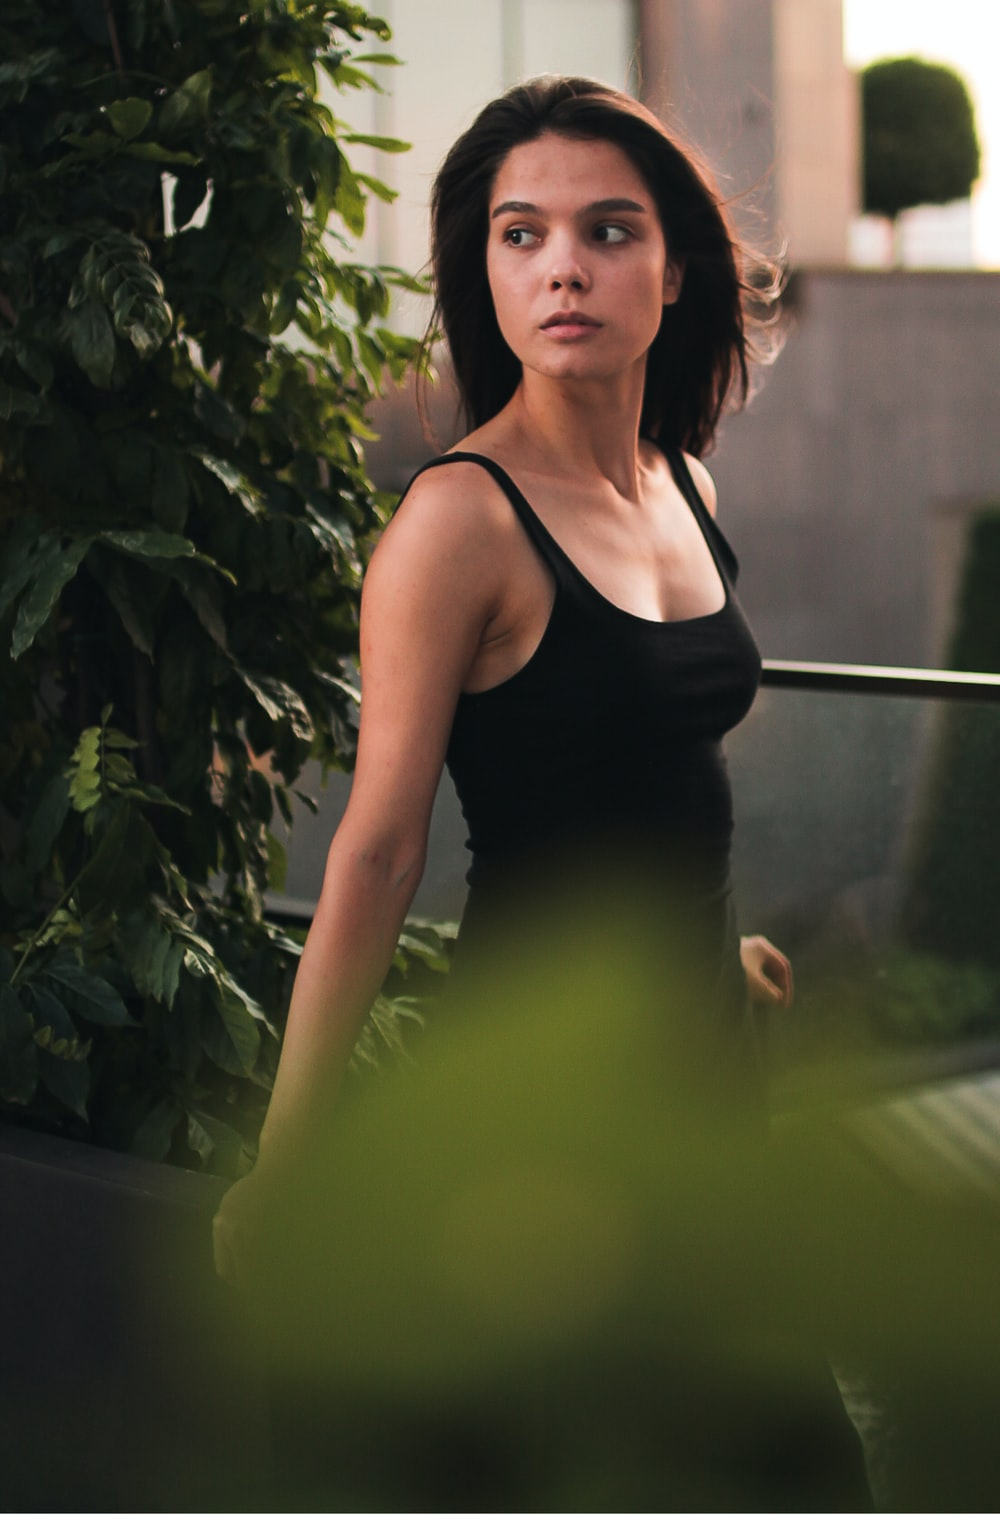 woman in black tank top standing beside green plant